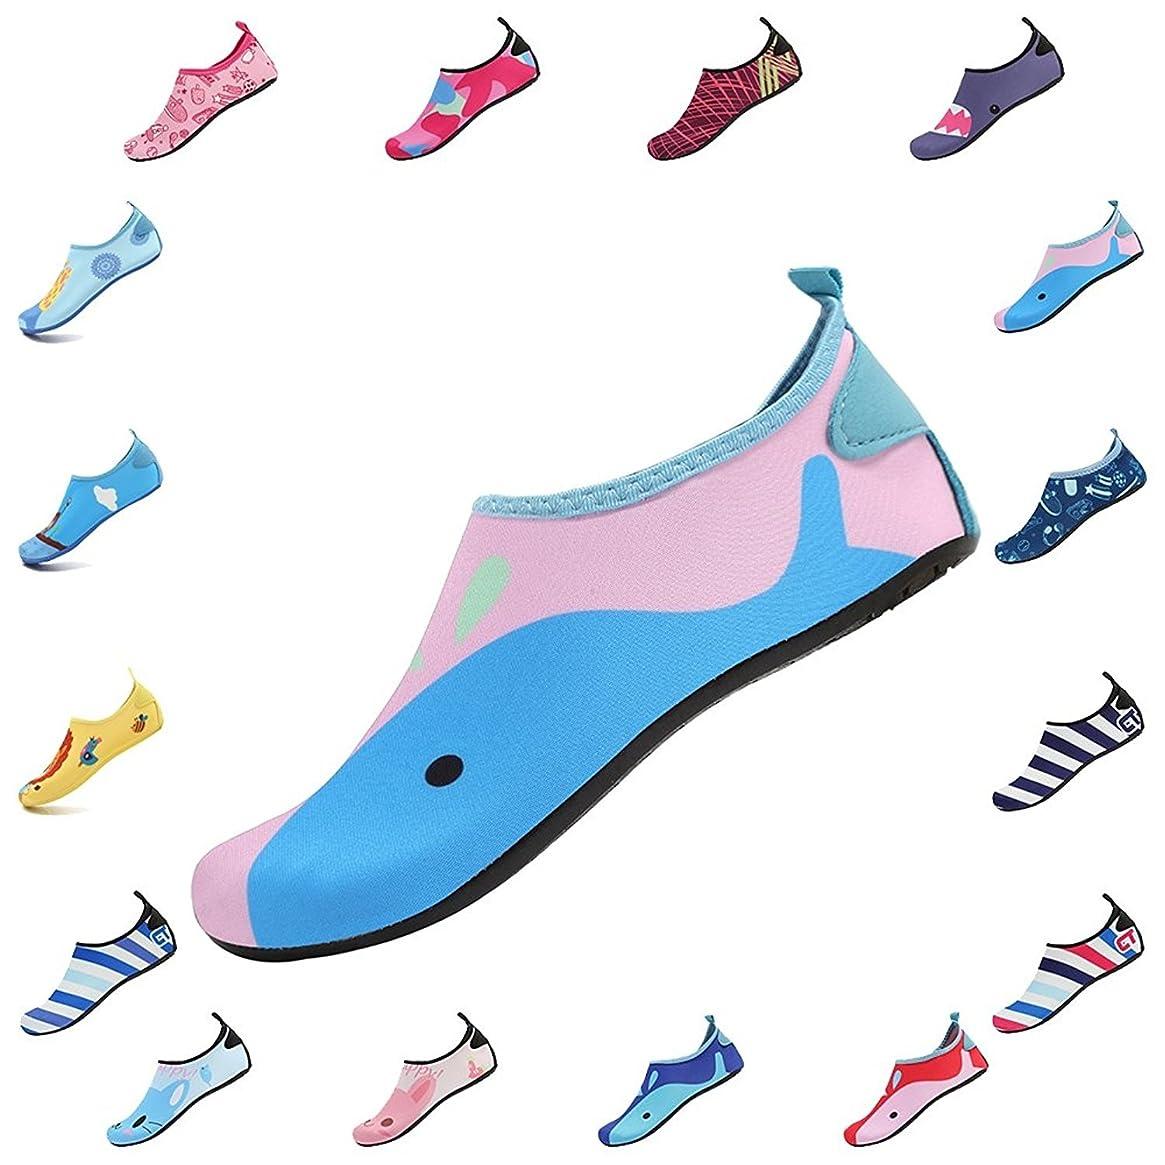 CIOR Kids Skin Barefoot Shoes Quick-Dry Water Shoes Mutifunctional Aqua Socks for Beach Pool Surf Shoes